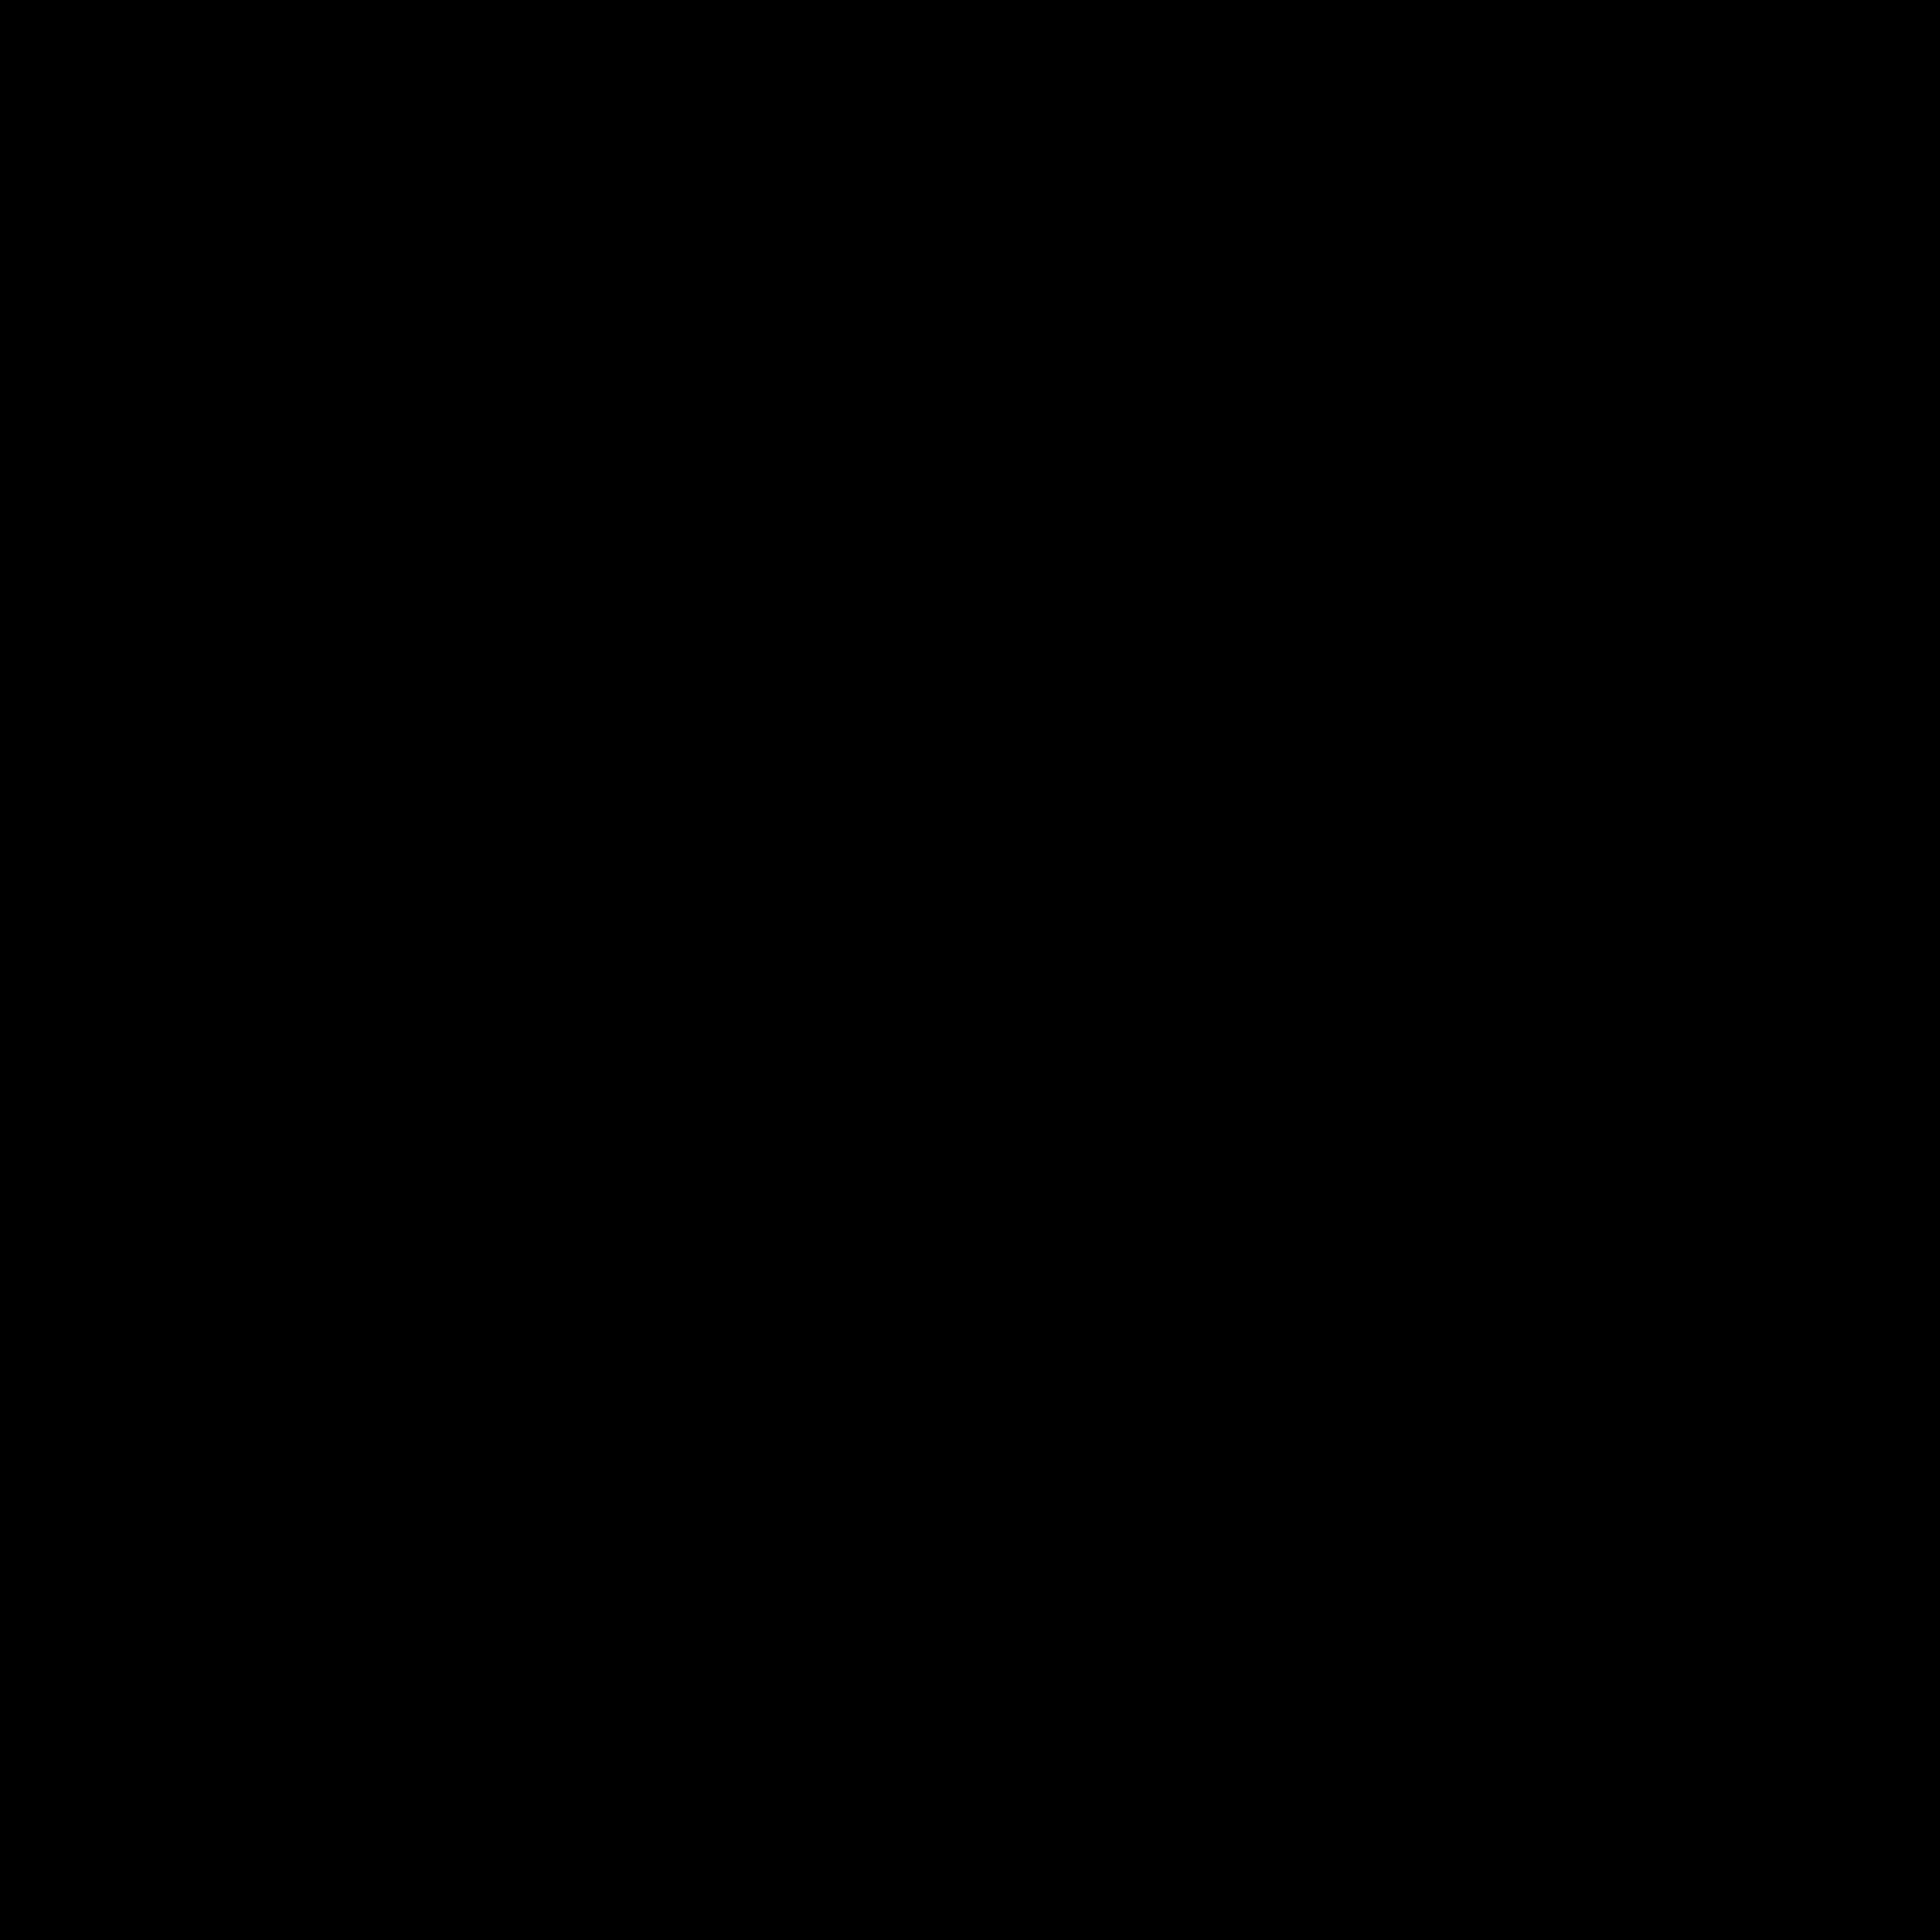 Federal Reserve Logo - FED Logo.